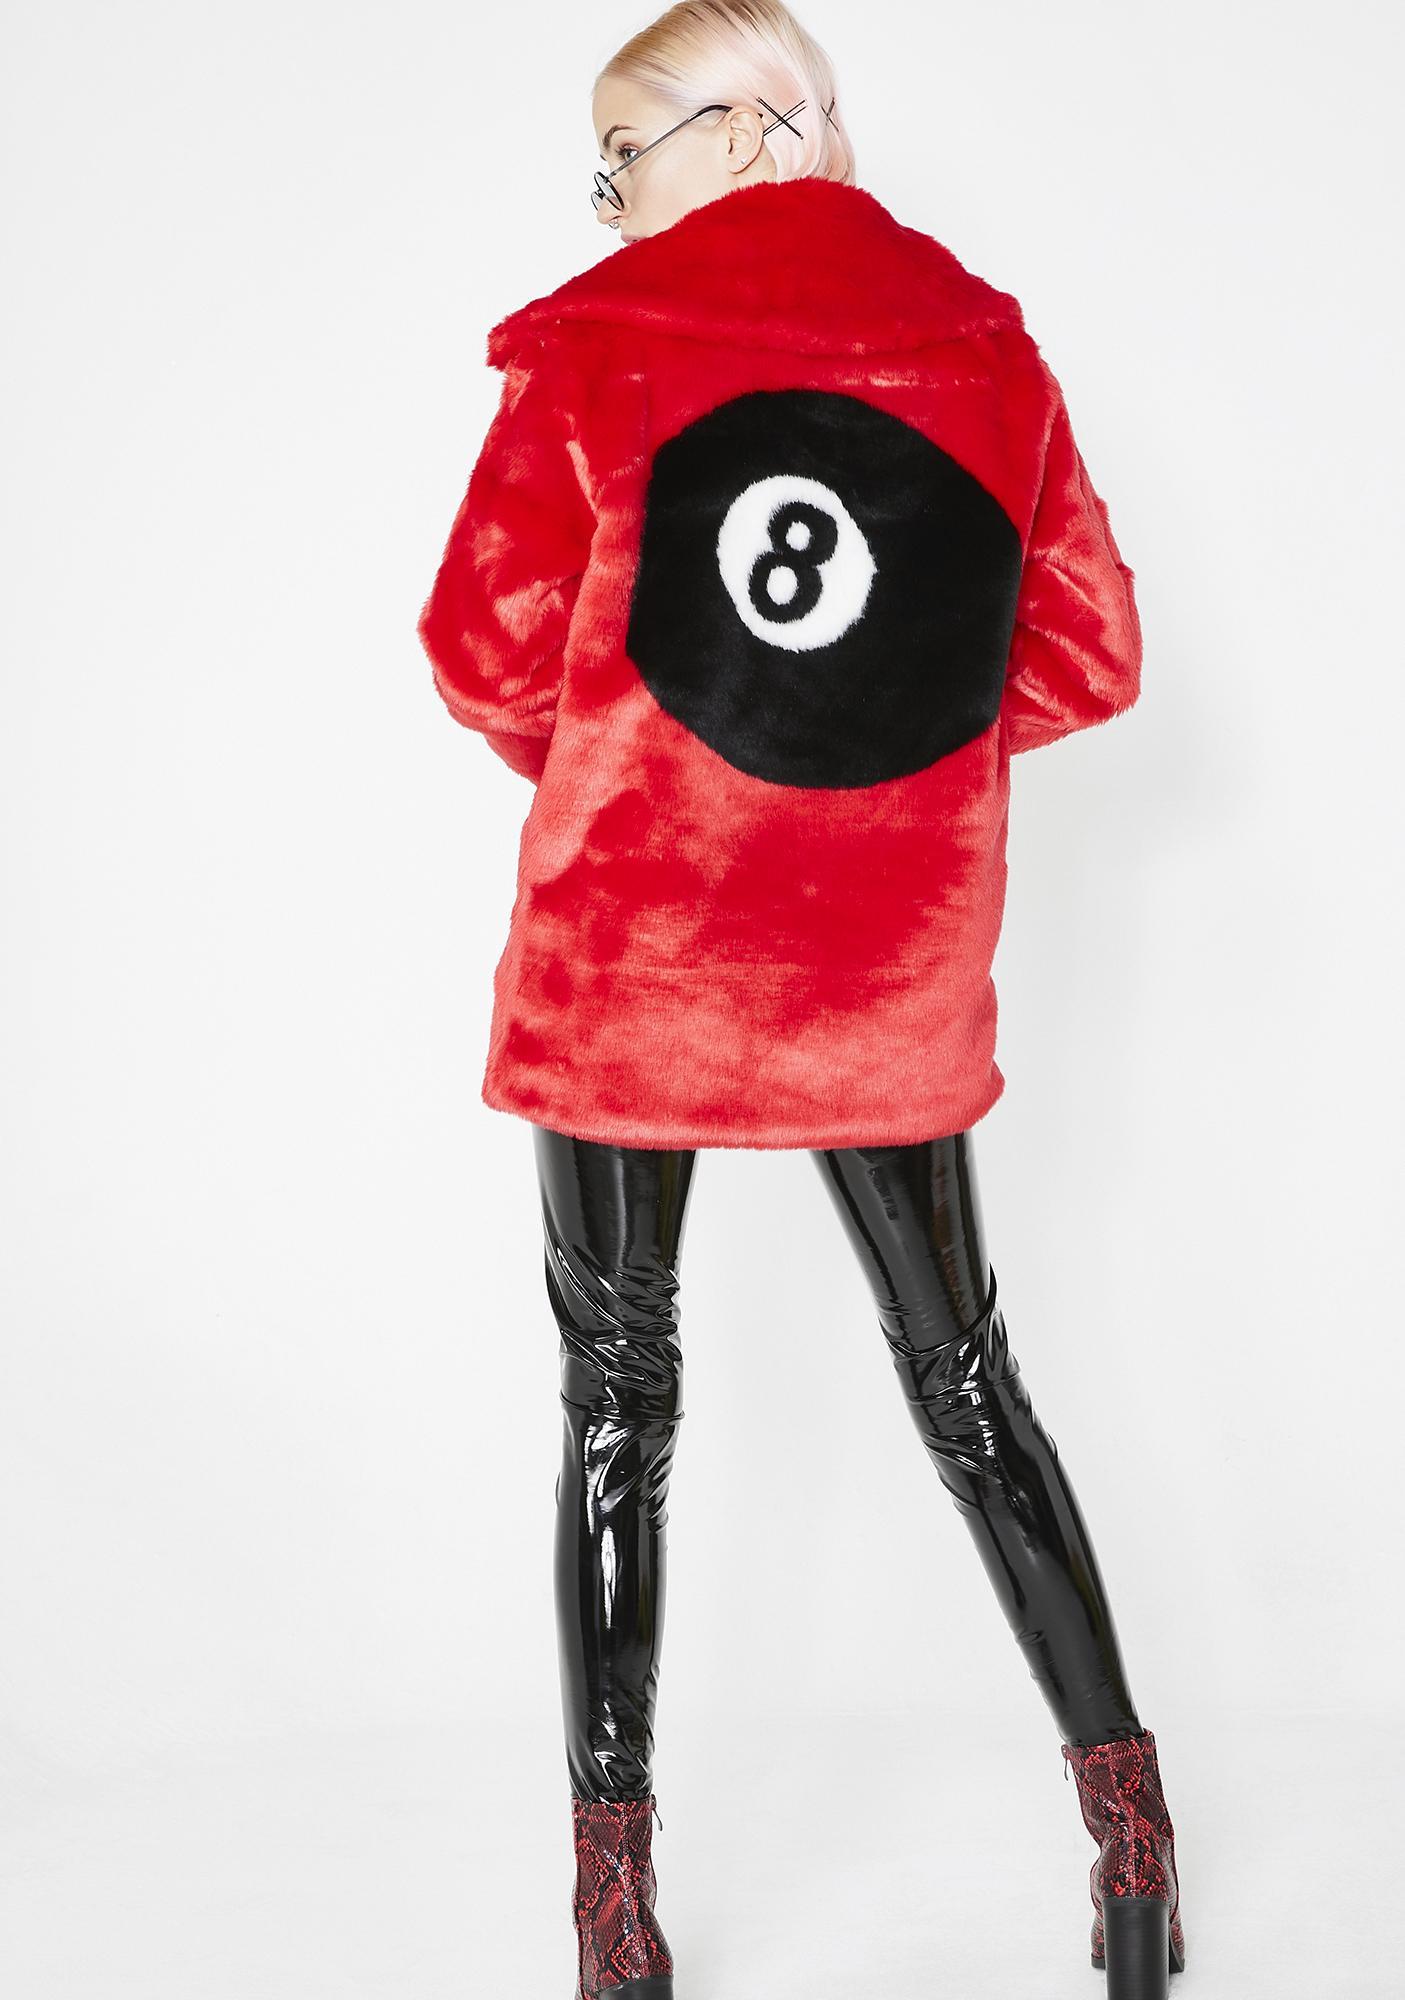 7411b9258 Racked Up Faux Fur Jacket